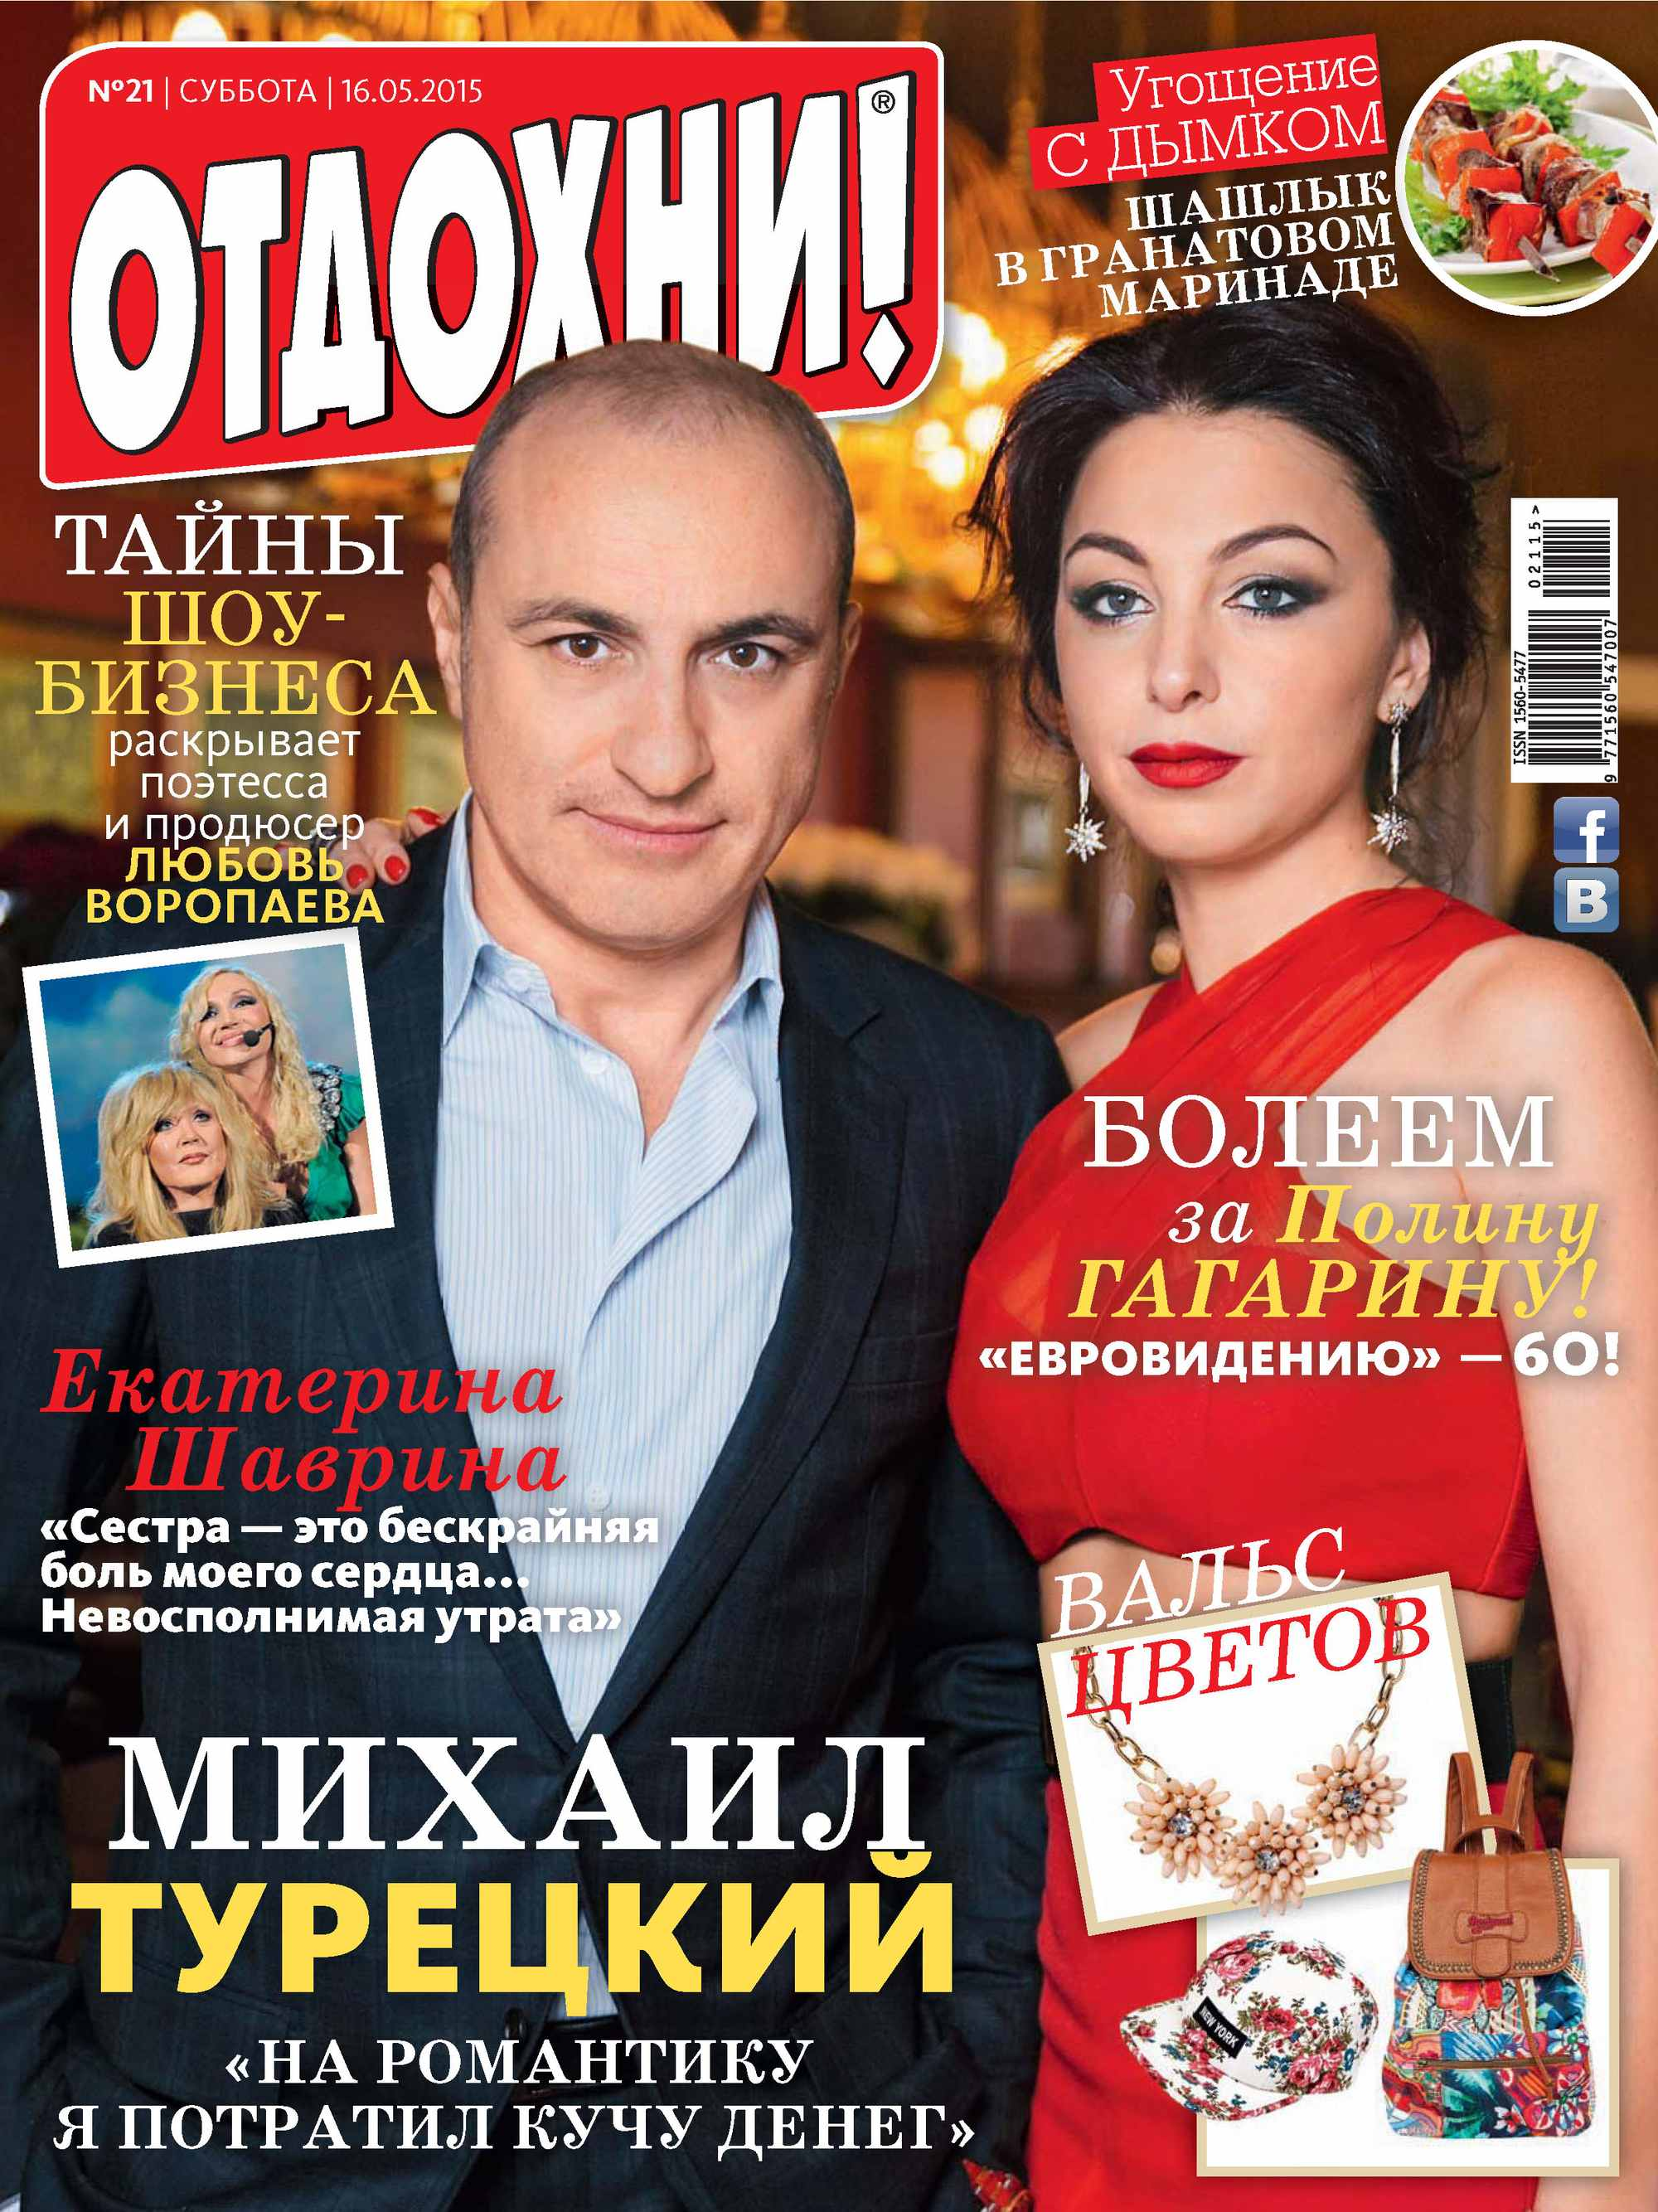 ИД «Бурда» Журнал «Отдохни!» №21/2015 ид бурда журнал отдохни 07 2015